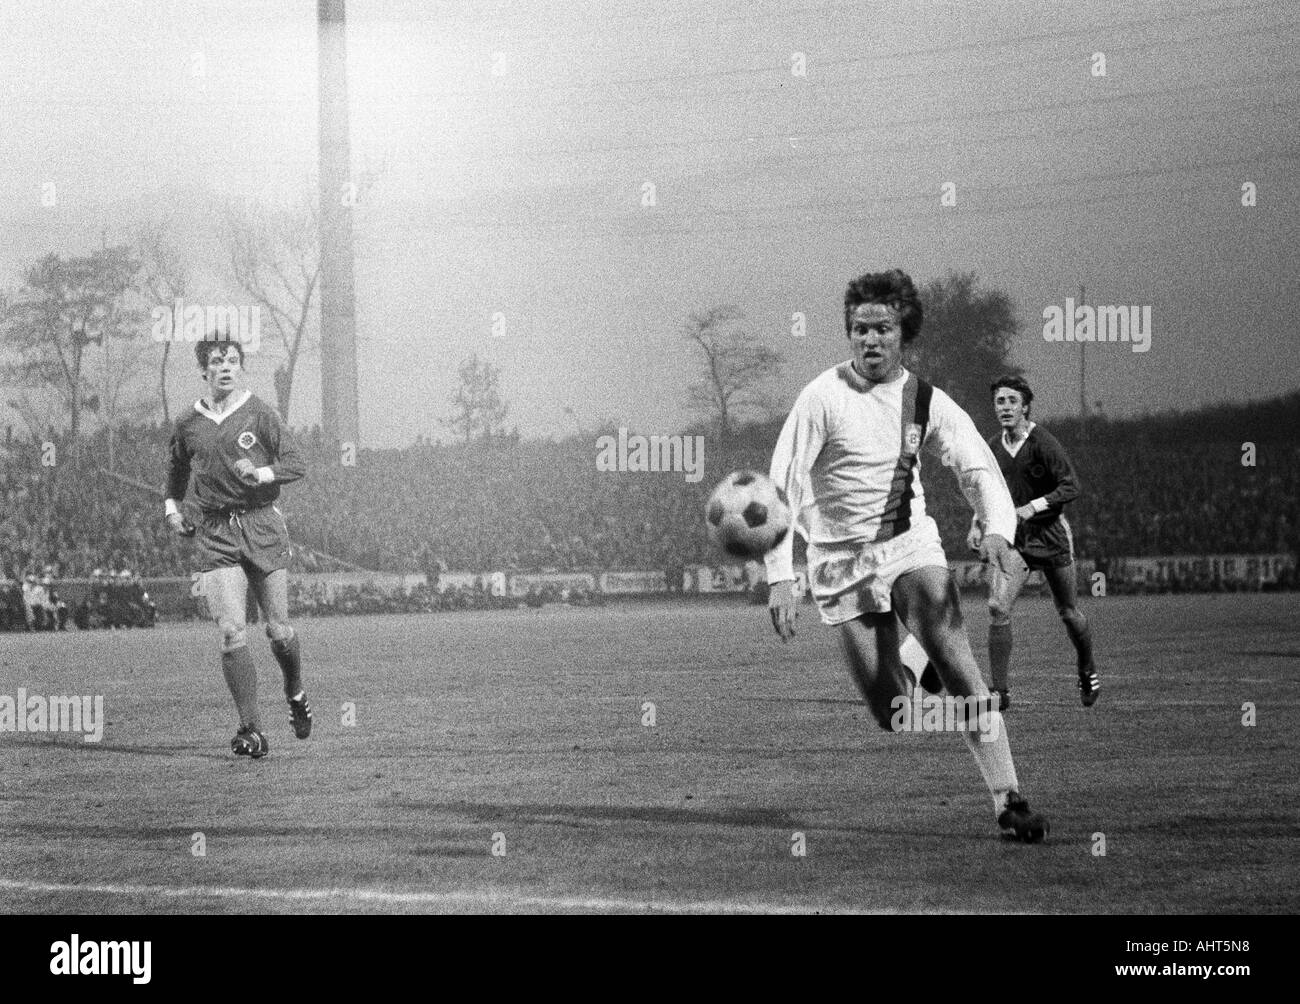 football, Bundesliga, 1970/1971, Rot-Weiss Oberhausen versus Borussia Moenchengladbach 0:2, Niederrhein Stadium in Oberhausen, scene of the match, f.l.t.r. Reiner Hollmann (RWO), Jupp Heynckes (MG), Werner Ohm (RWO) - Stock Image